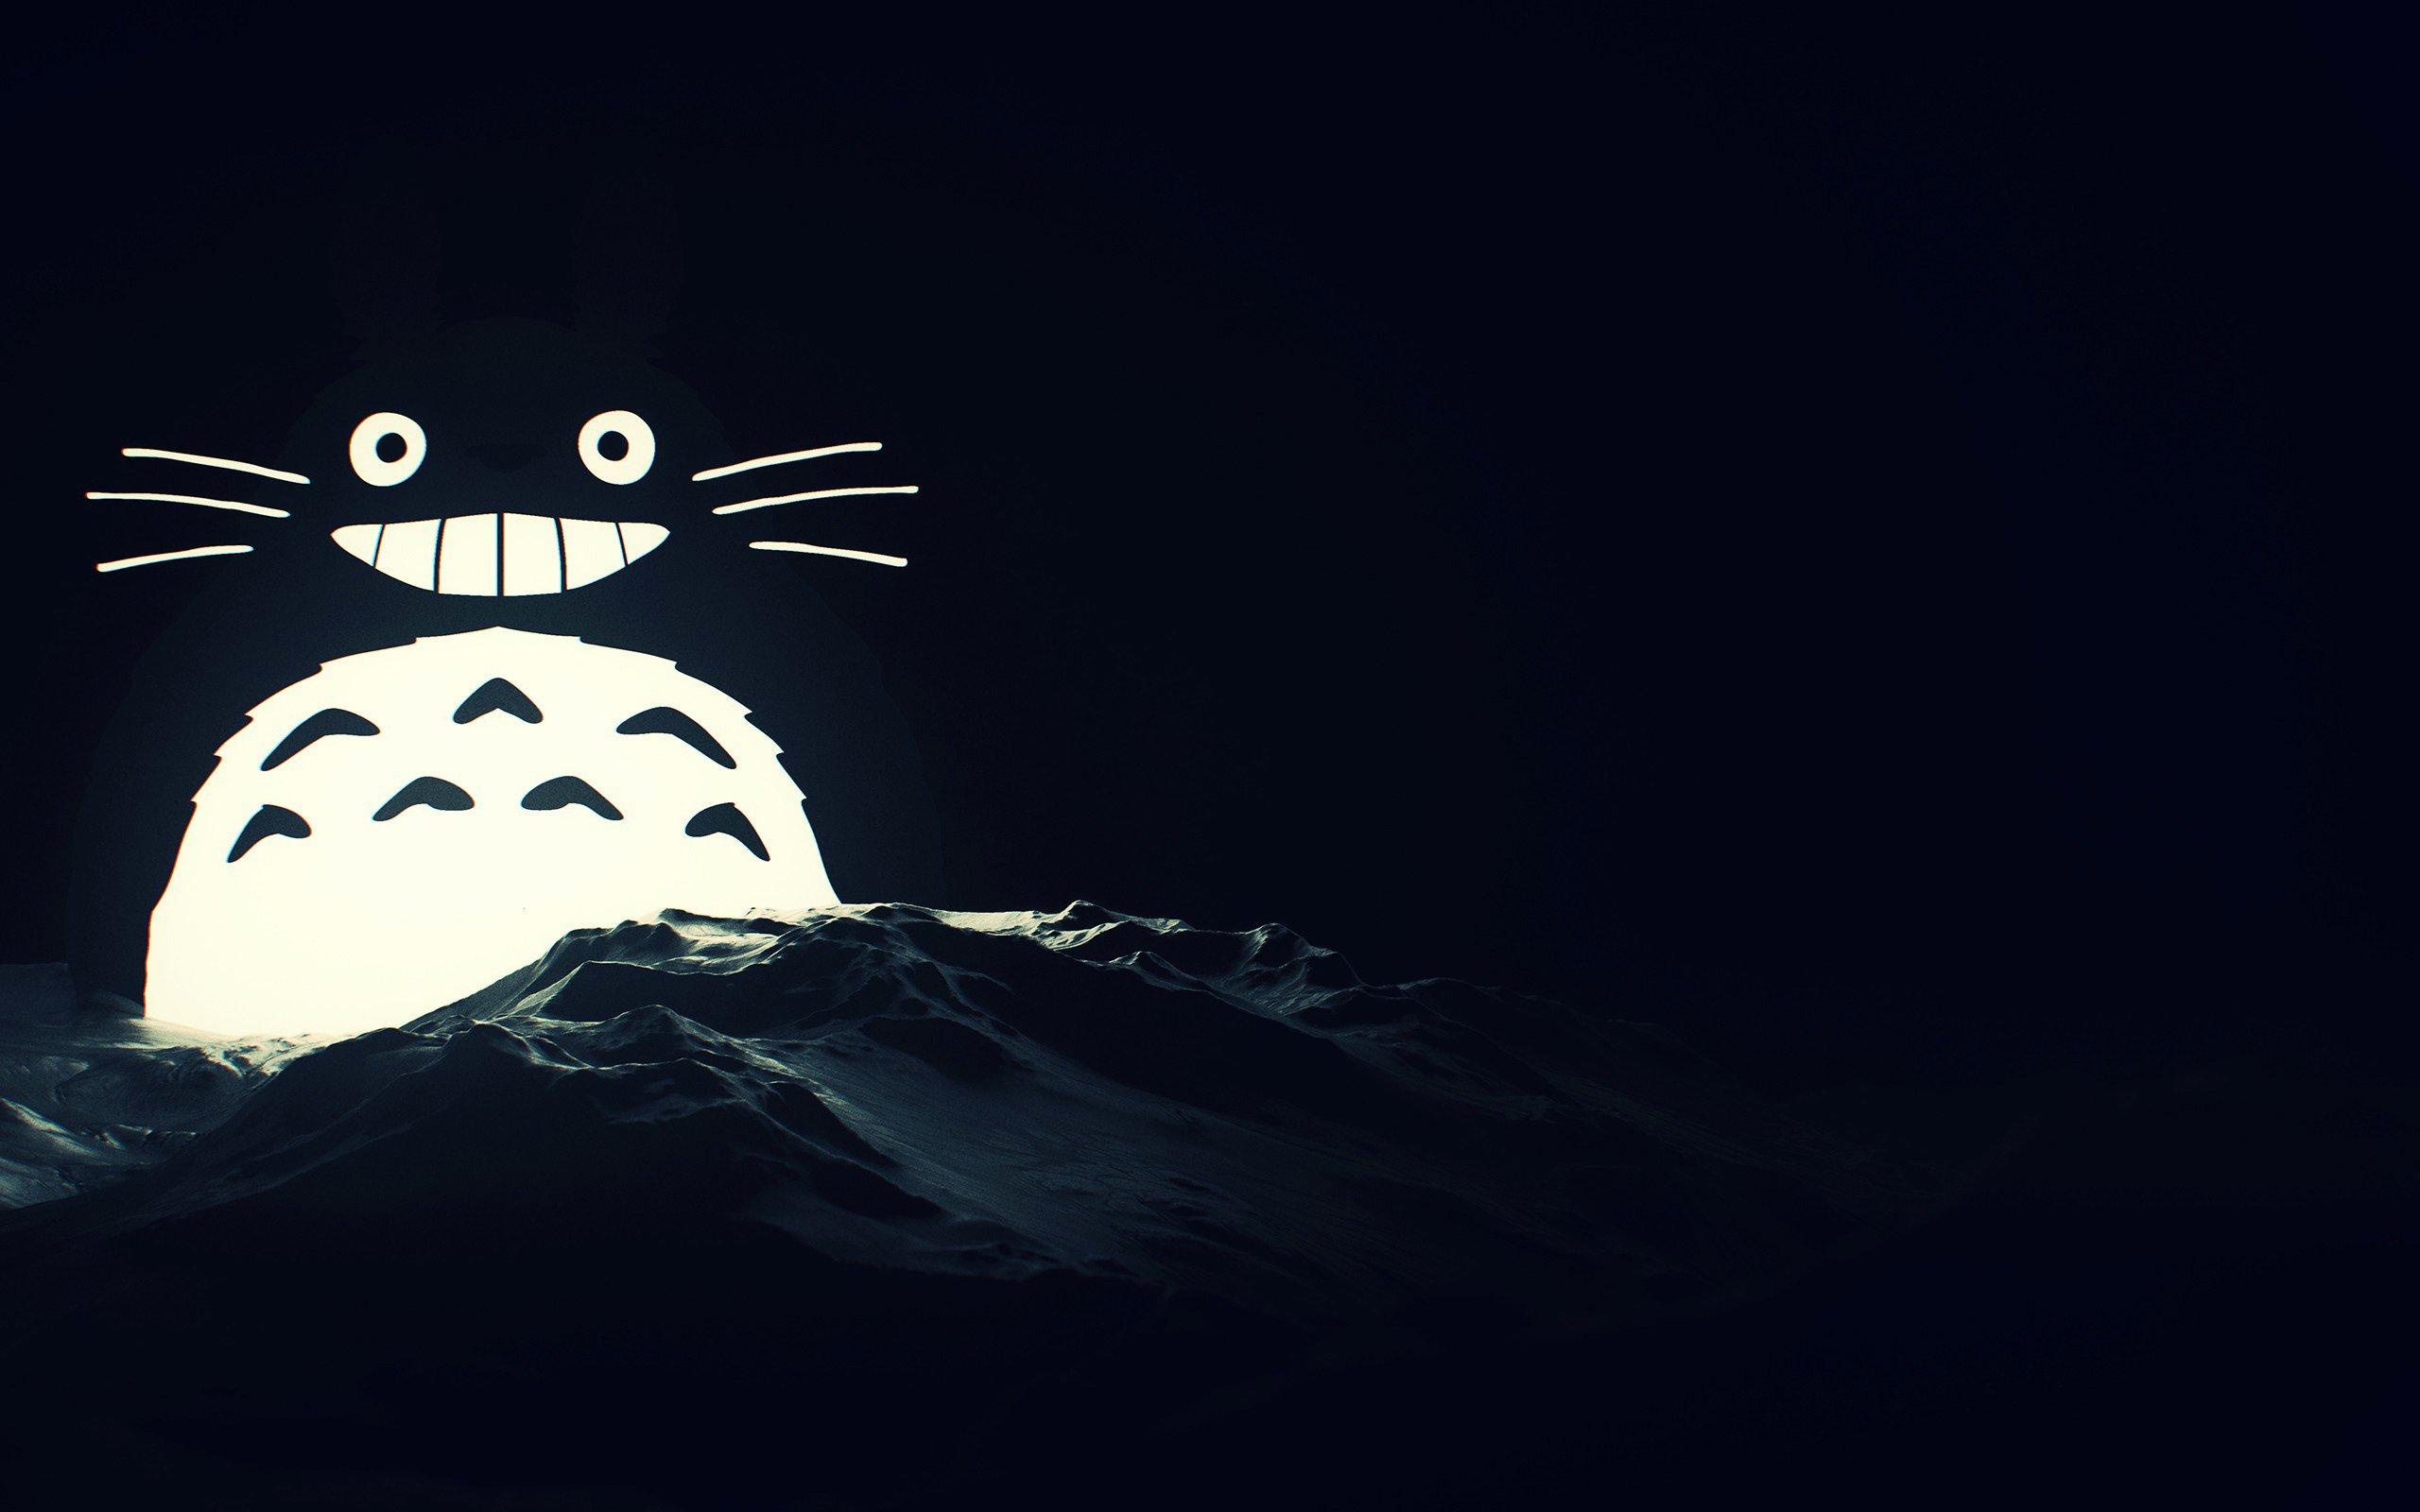 Fondos de pantalla Mi vecino Totoro